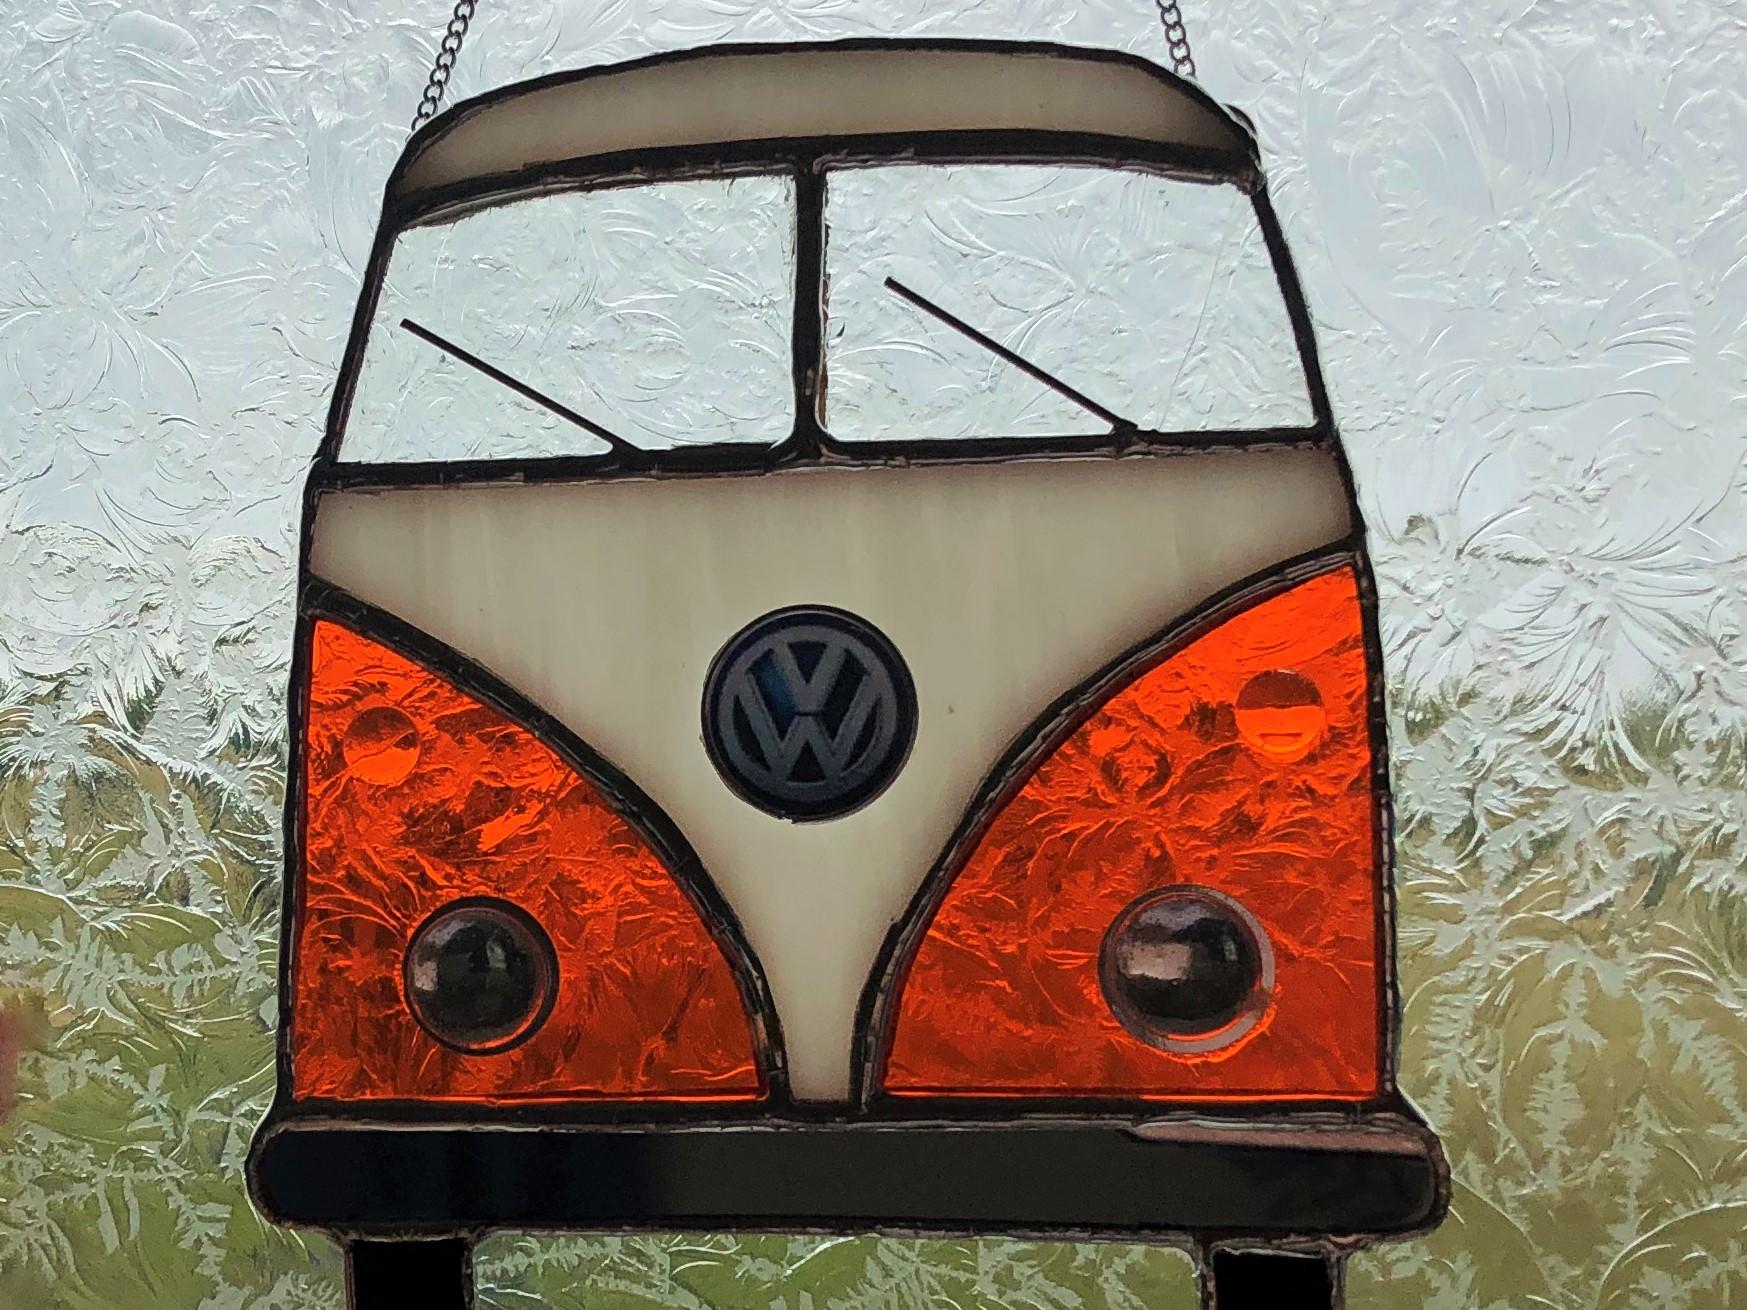 Orange & White VW Camper